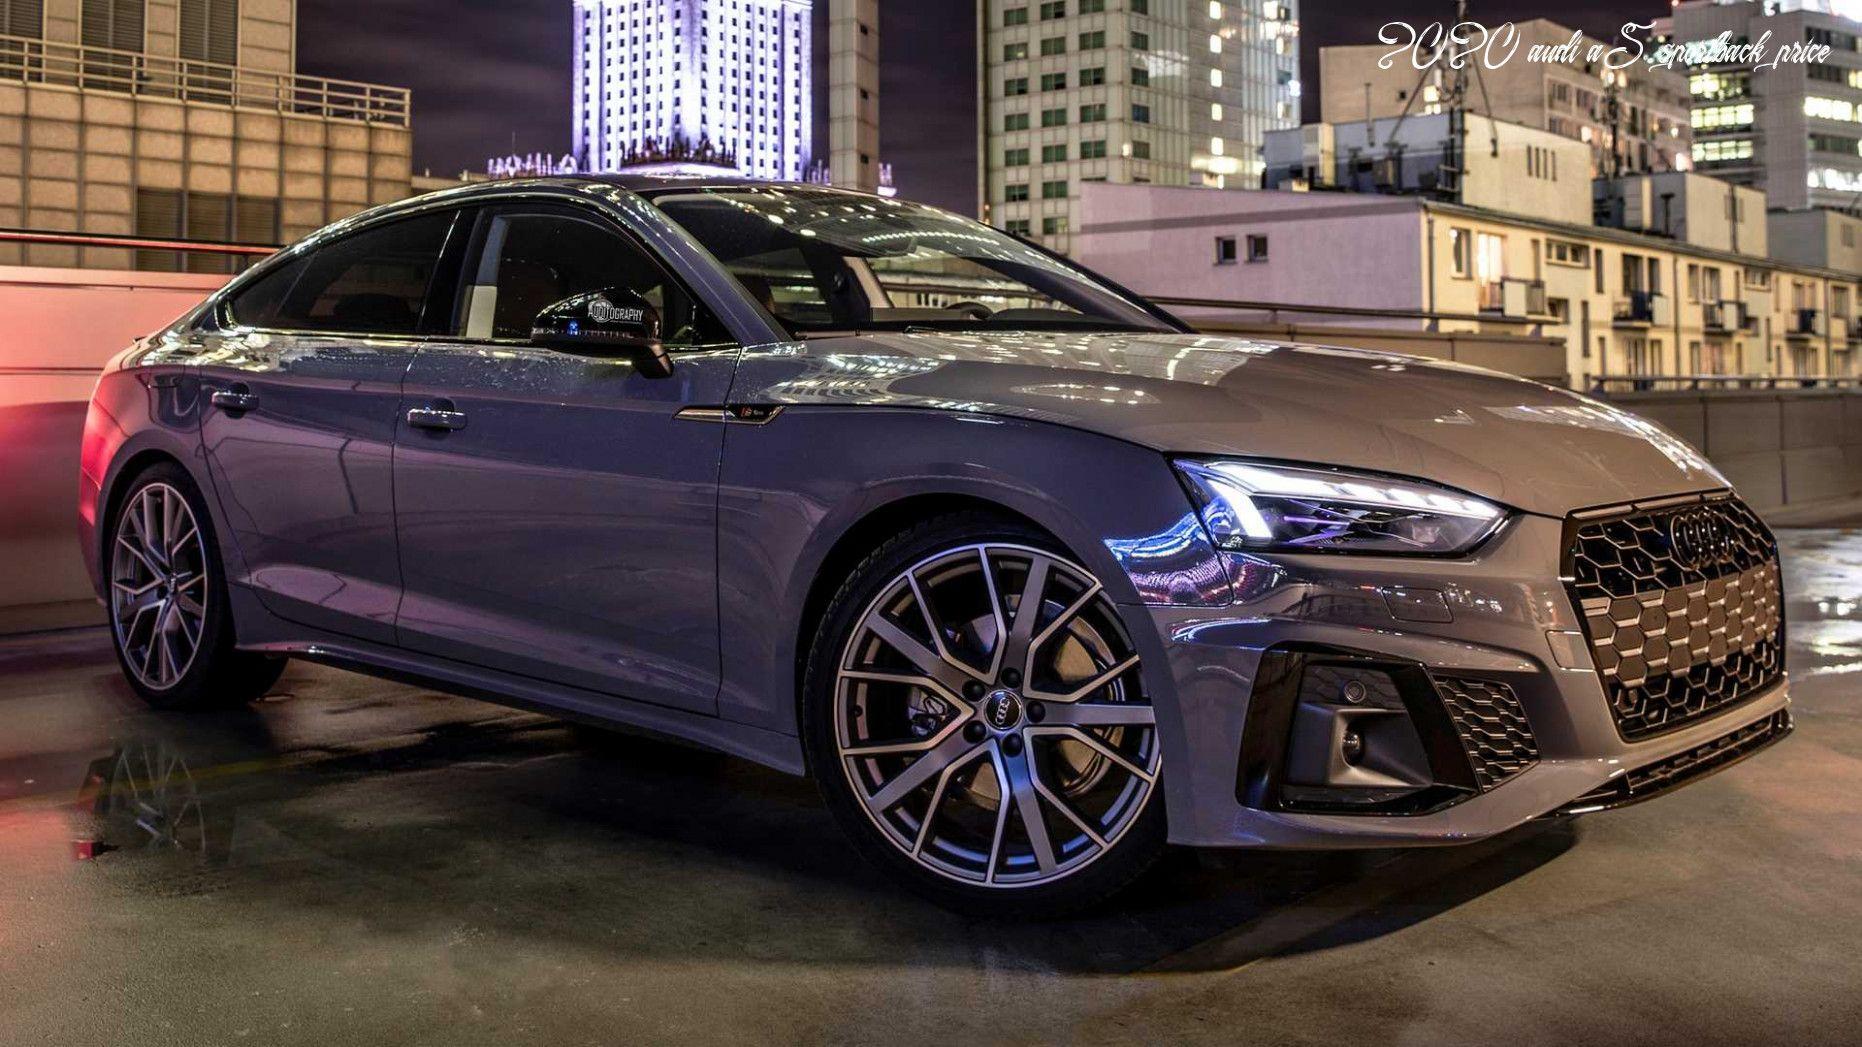 2020 Audi A5 Sportback Price In 2020 Audi S5 Sportback Audi A5 Audi A5 Sportback